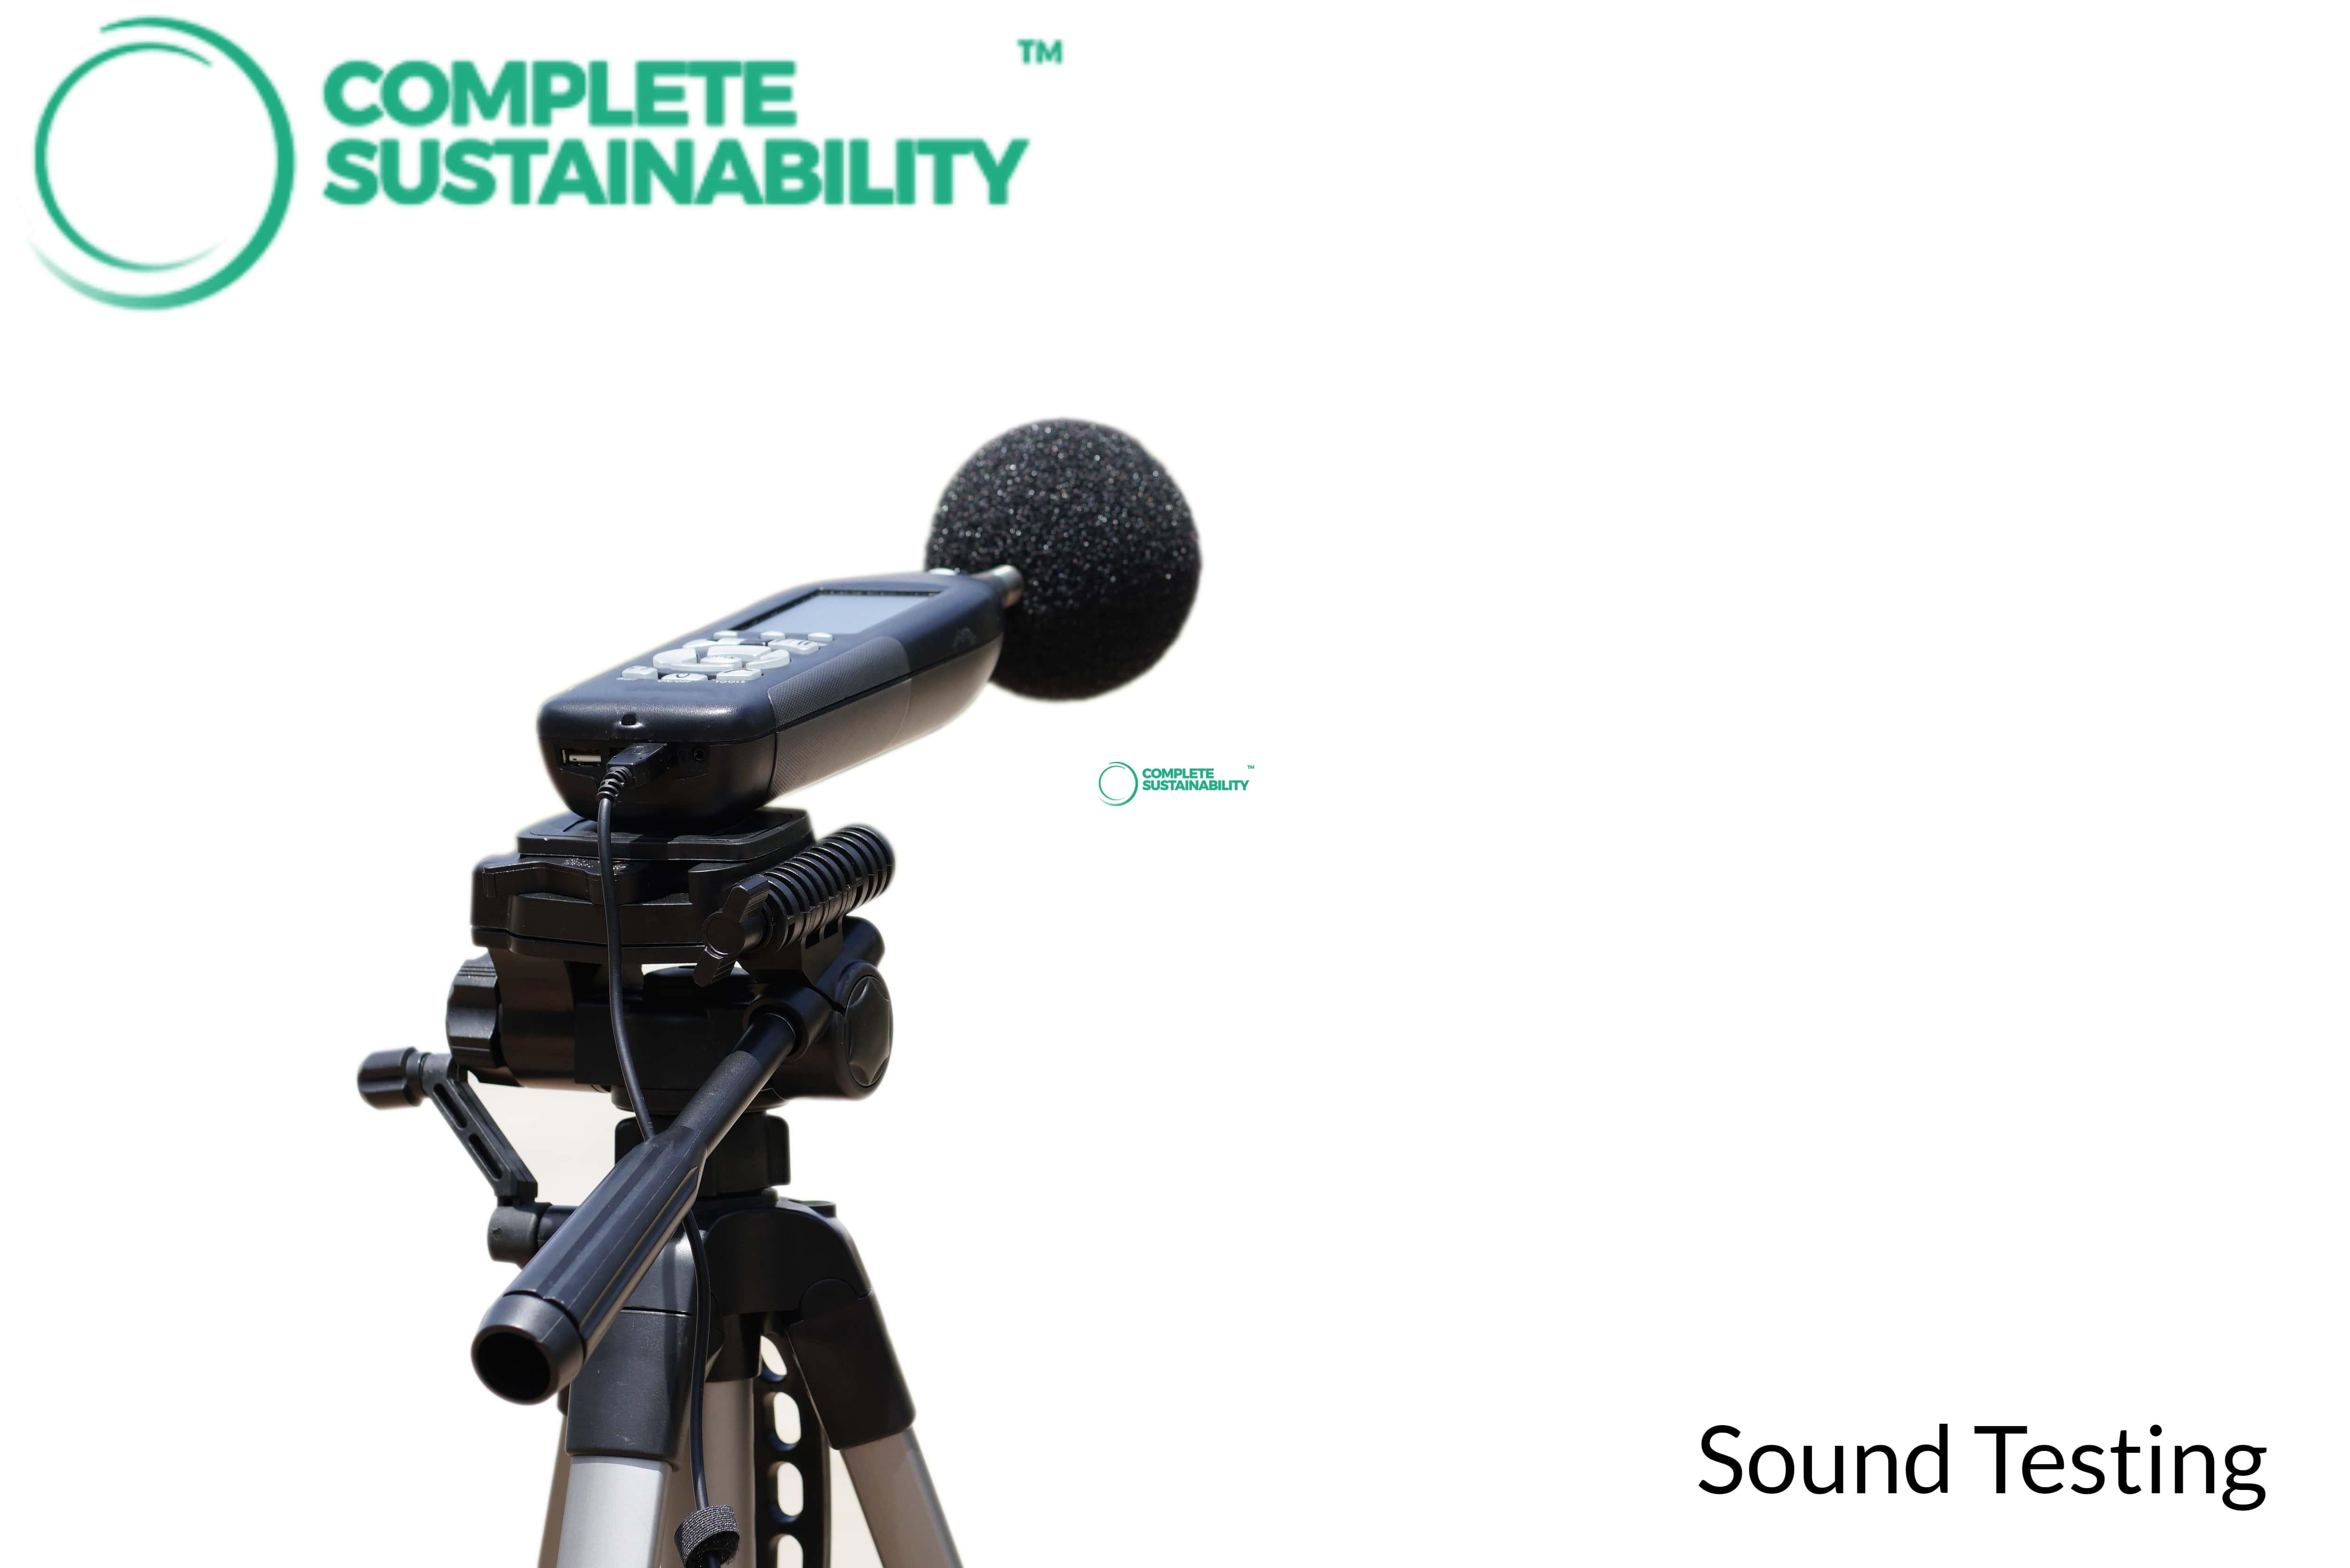 Sound Testing